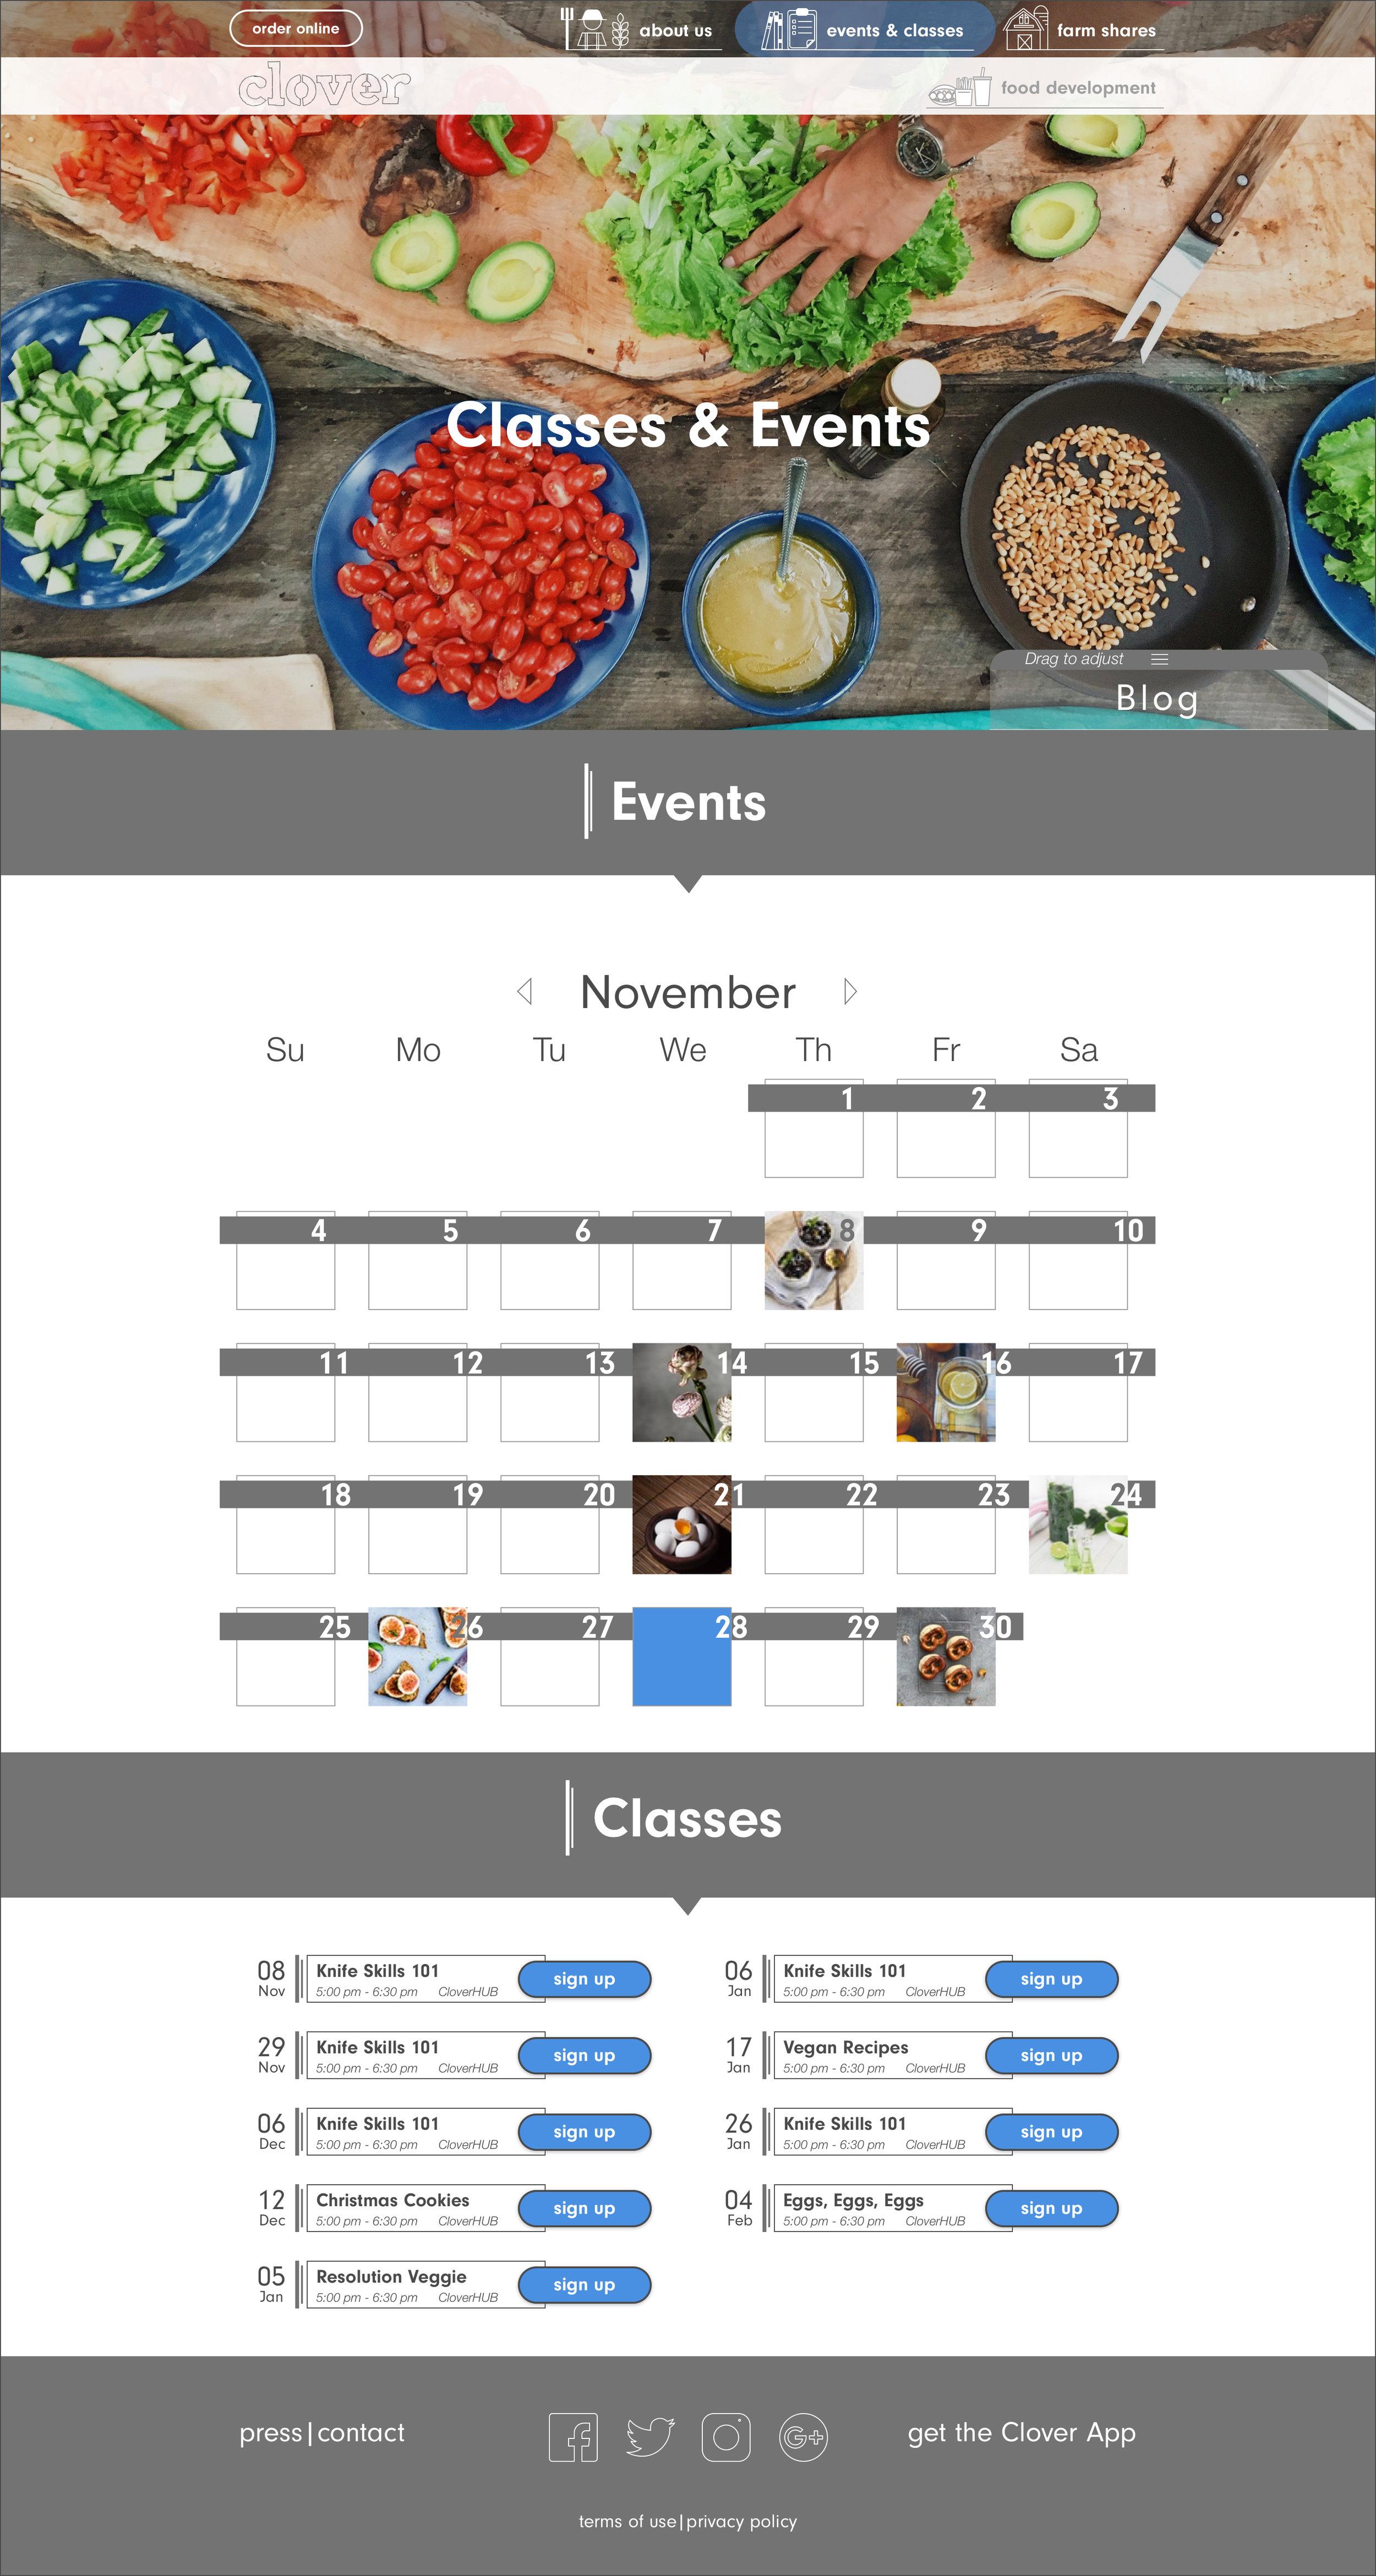 Classes & Events w:border.jpg